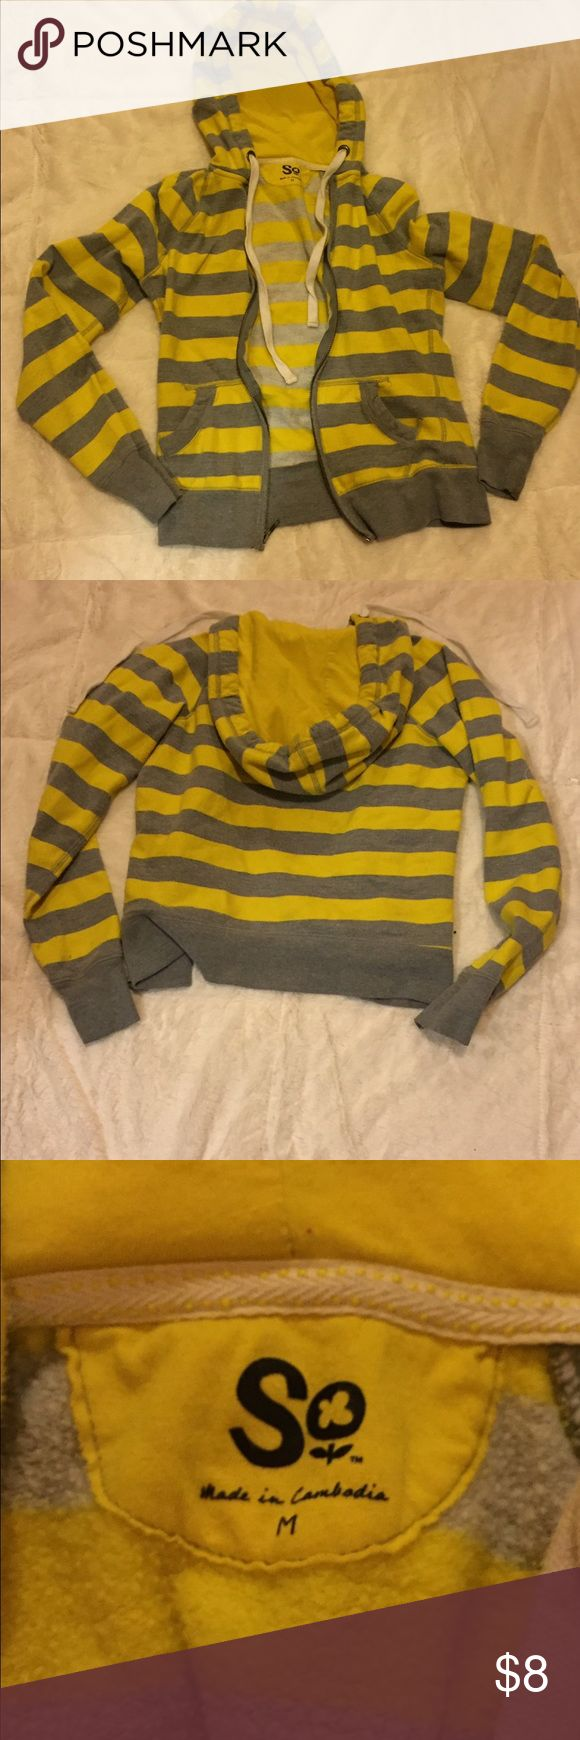 Gray and yellow striped zip up hoodie Zip up hoodie, soft material, gray and yellow, good condition. SO Shirts & Tops Sweatshirts & Hoodies